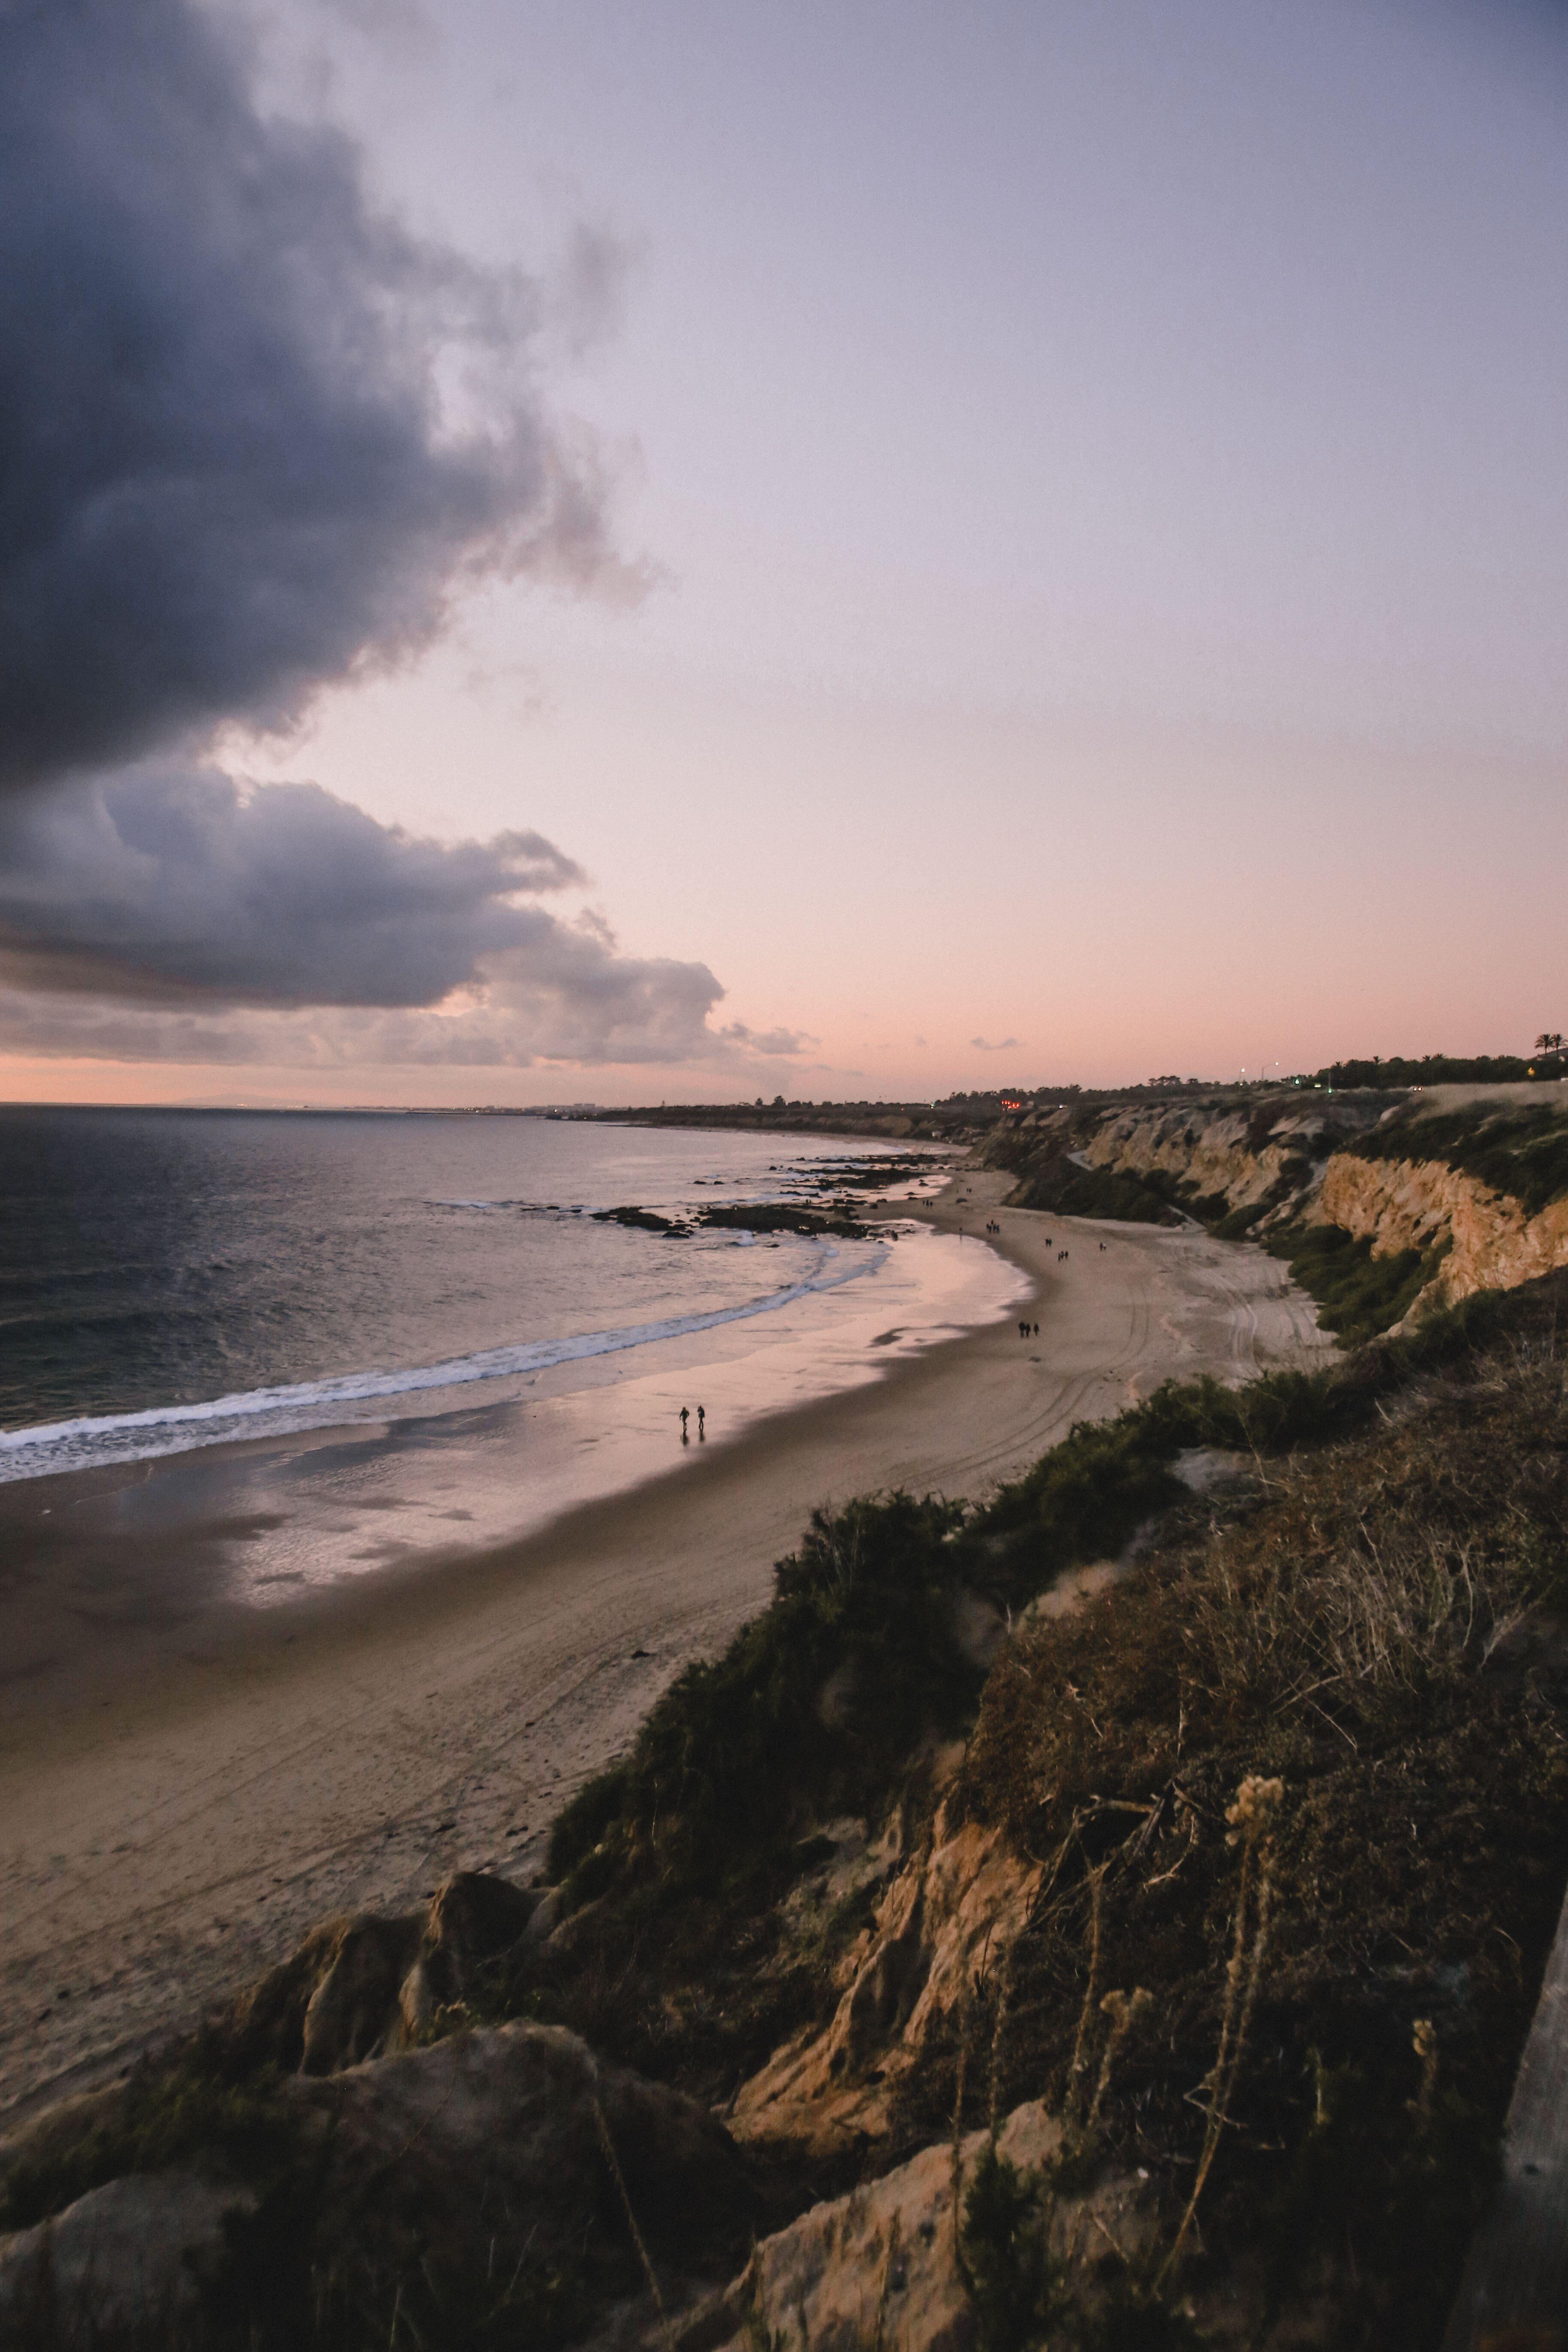 Beach Aesthetic Southern California Wallpaper Iphone In 2020 California Wallpaper Beach Aesthetic Beach